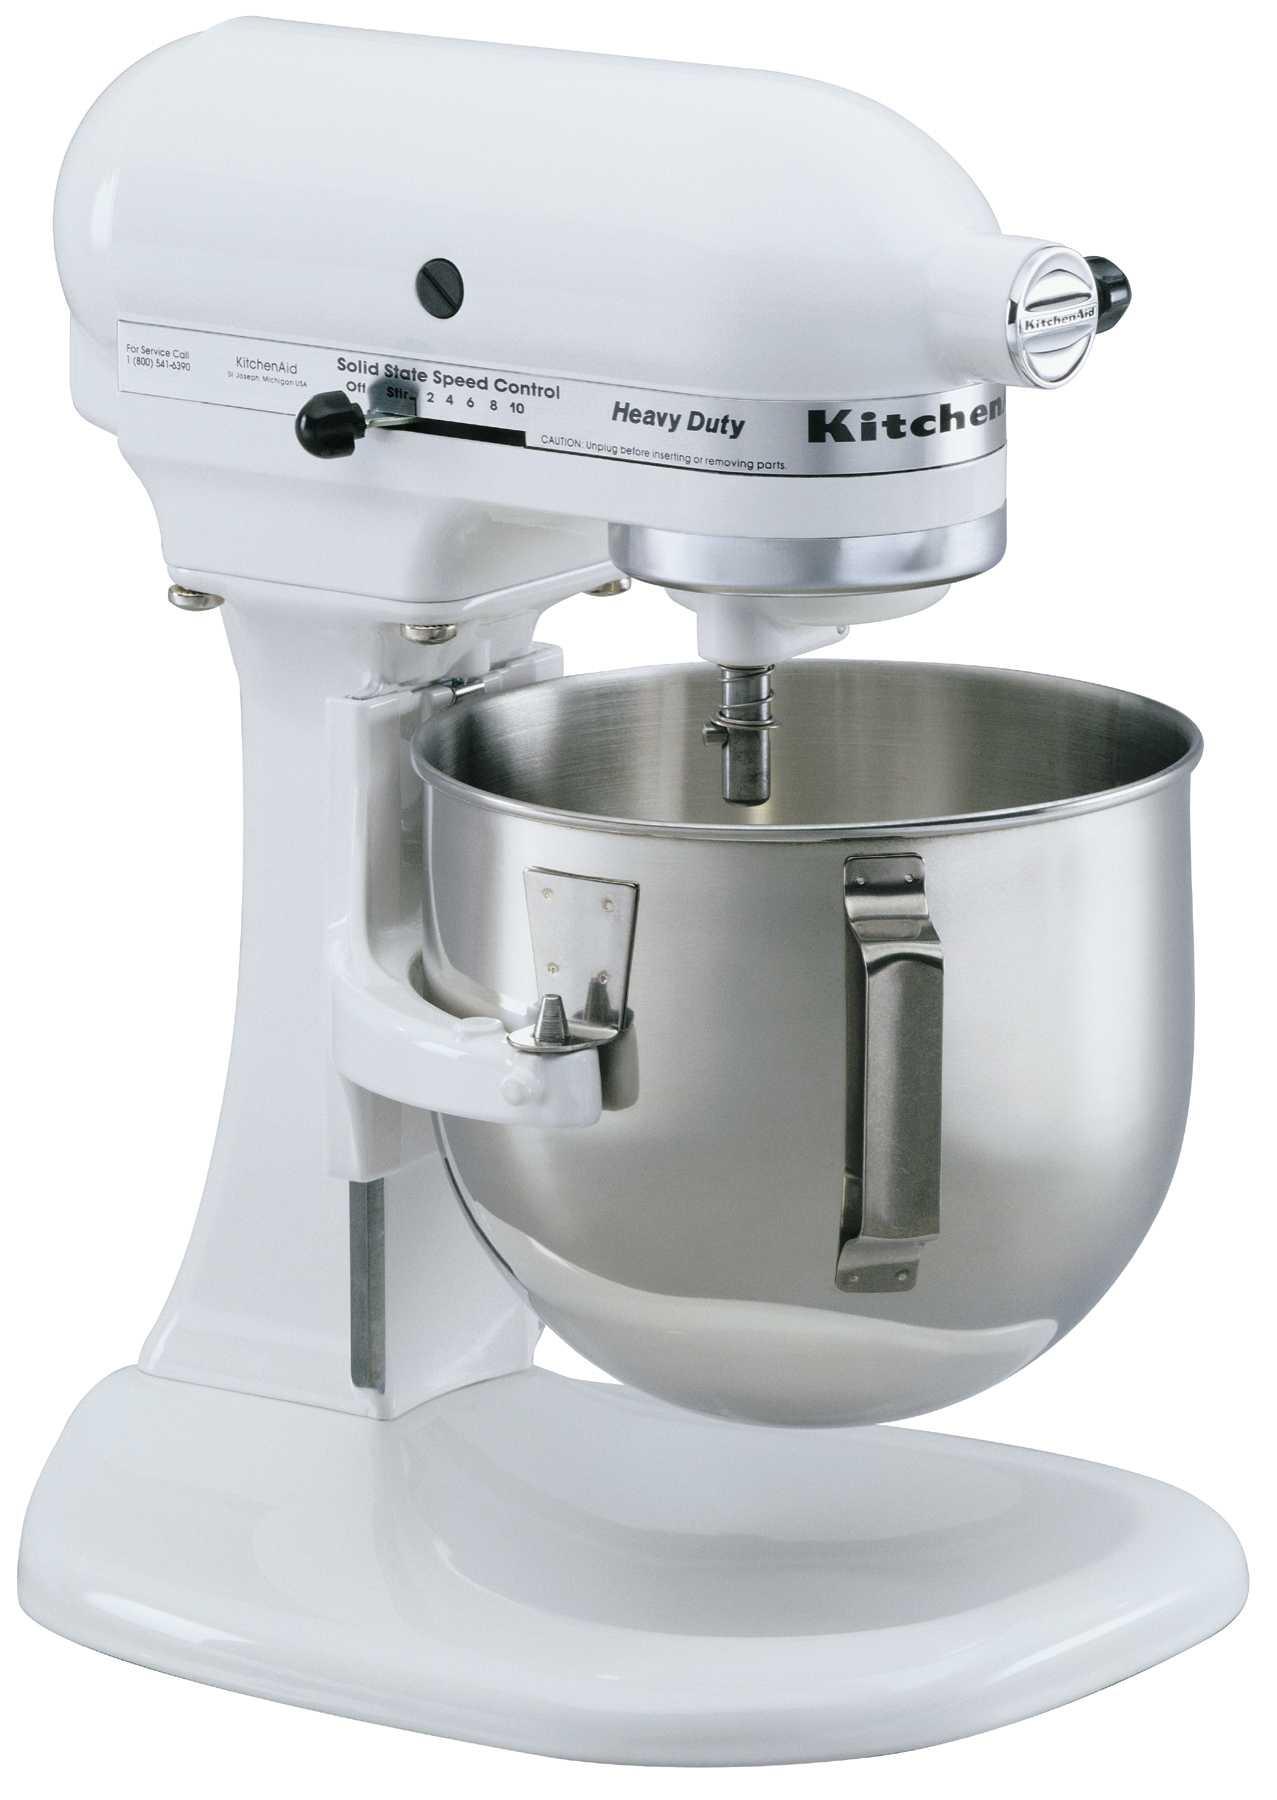 Kitchenaid accessories for mixer photo - 2